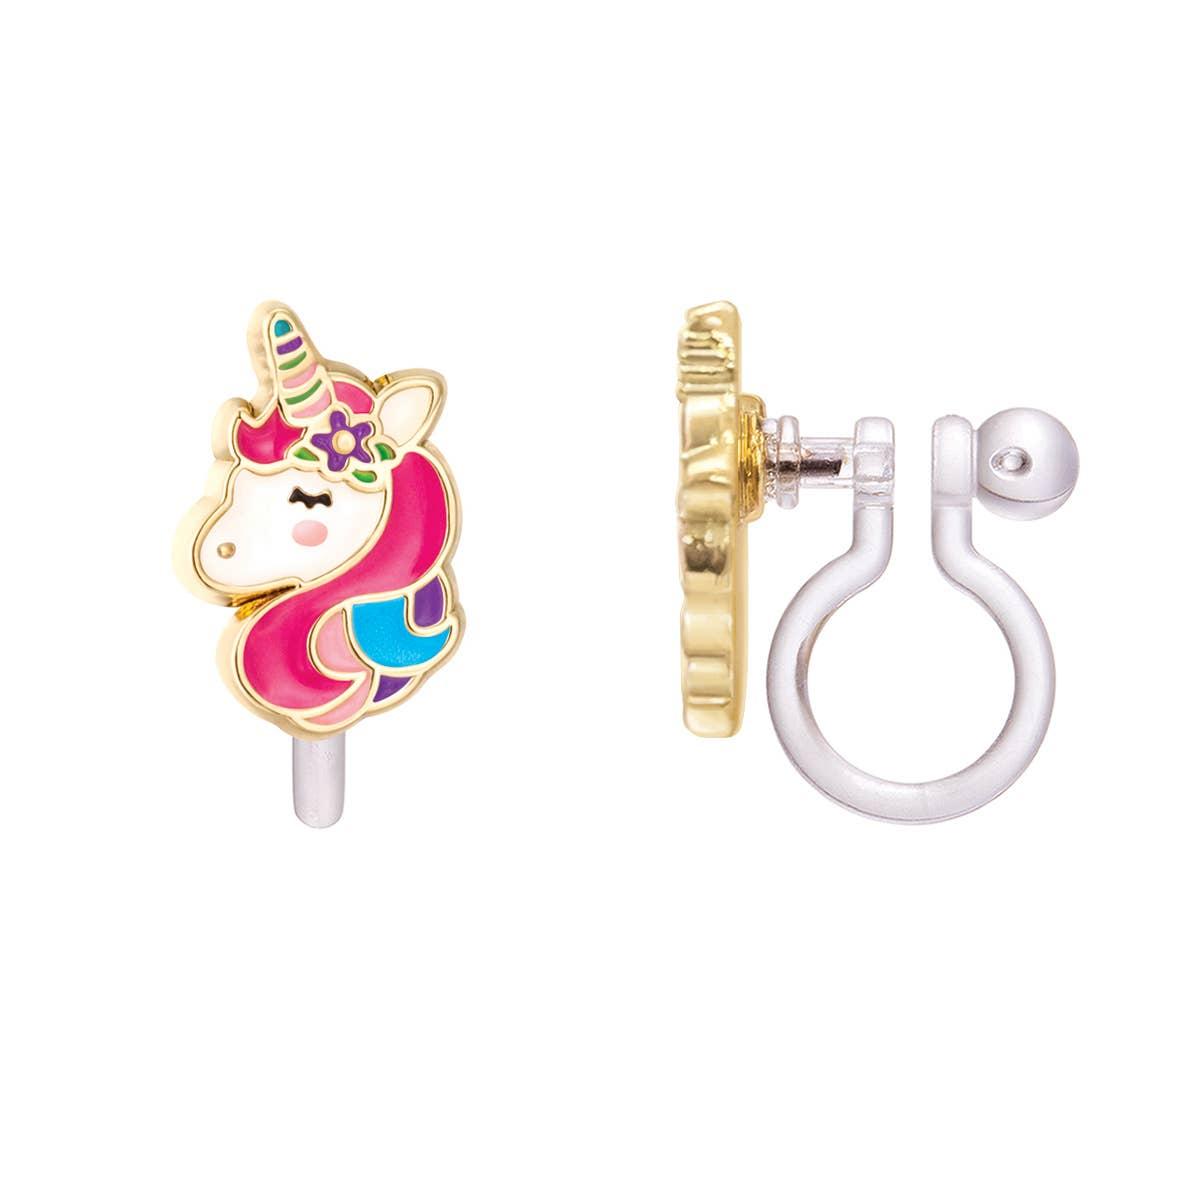 CLIP ON Cutie Earrings- Unicorn Dreams | Trada Marketplace